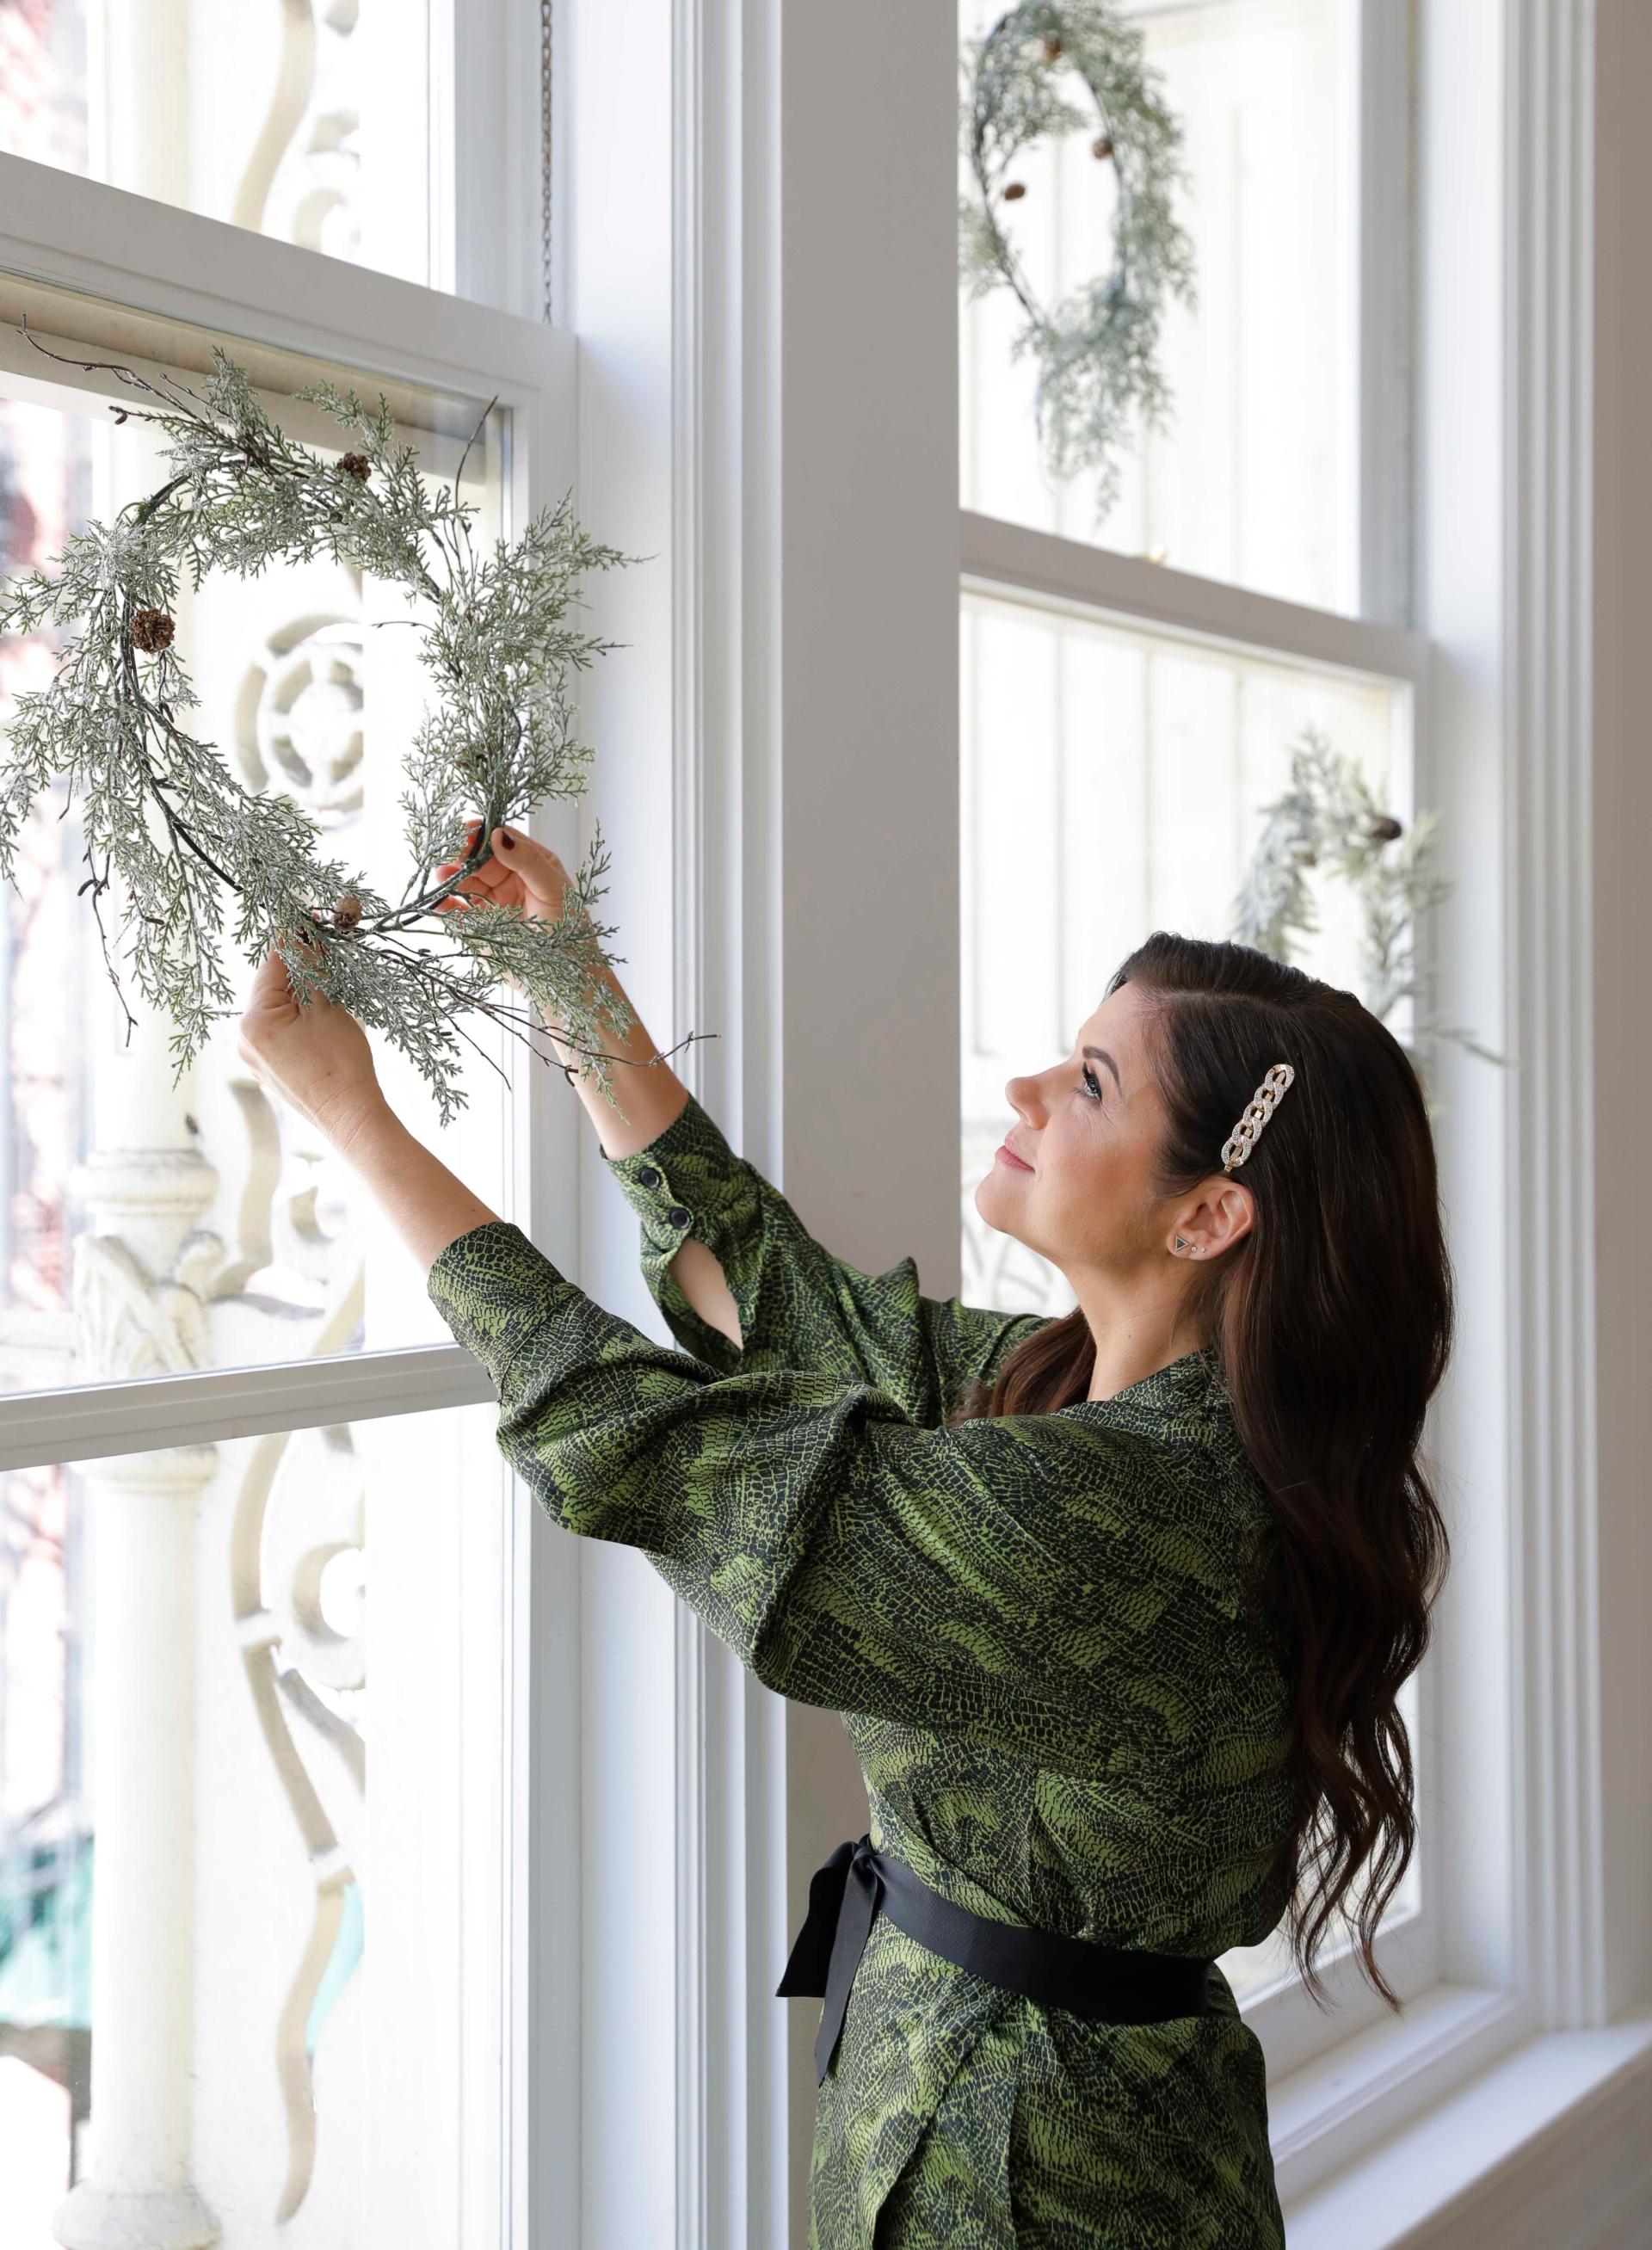 Tiffani Thiessen hanging wreath